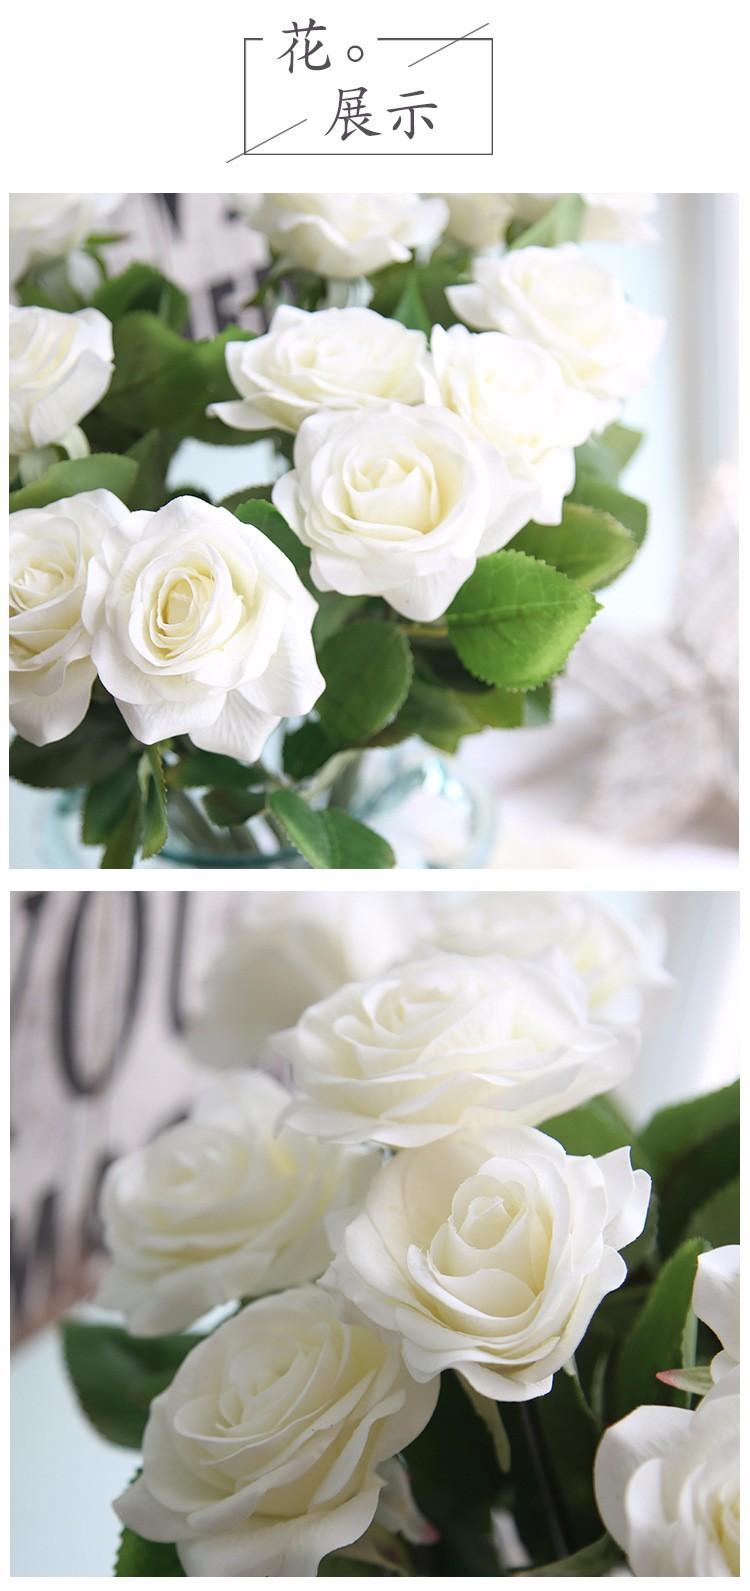 White Artificial Rose Plastic Rose Bouquet For Wedding Decoration